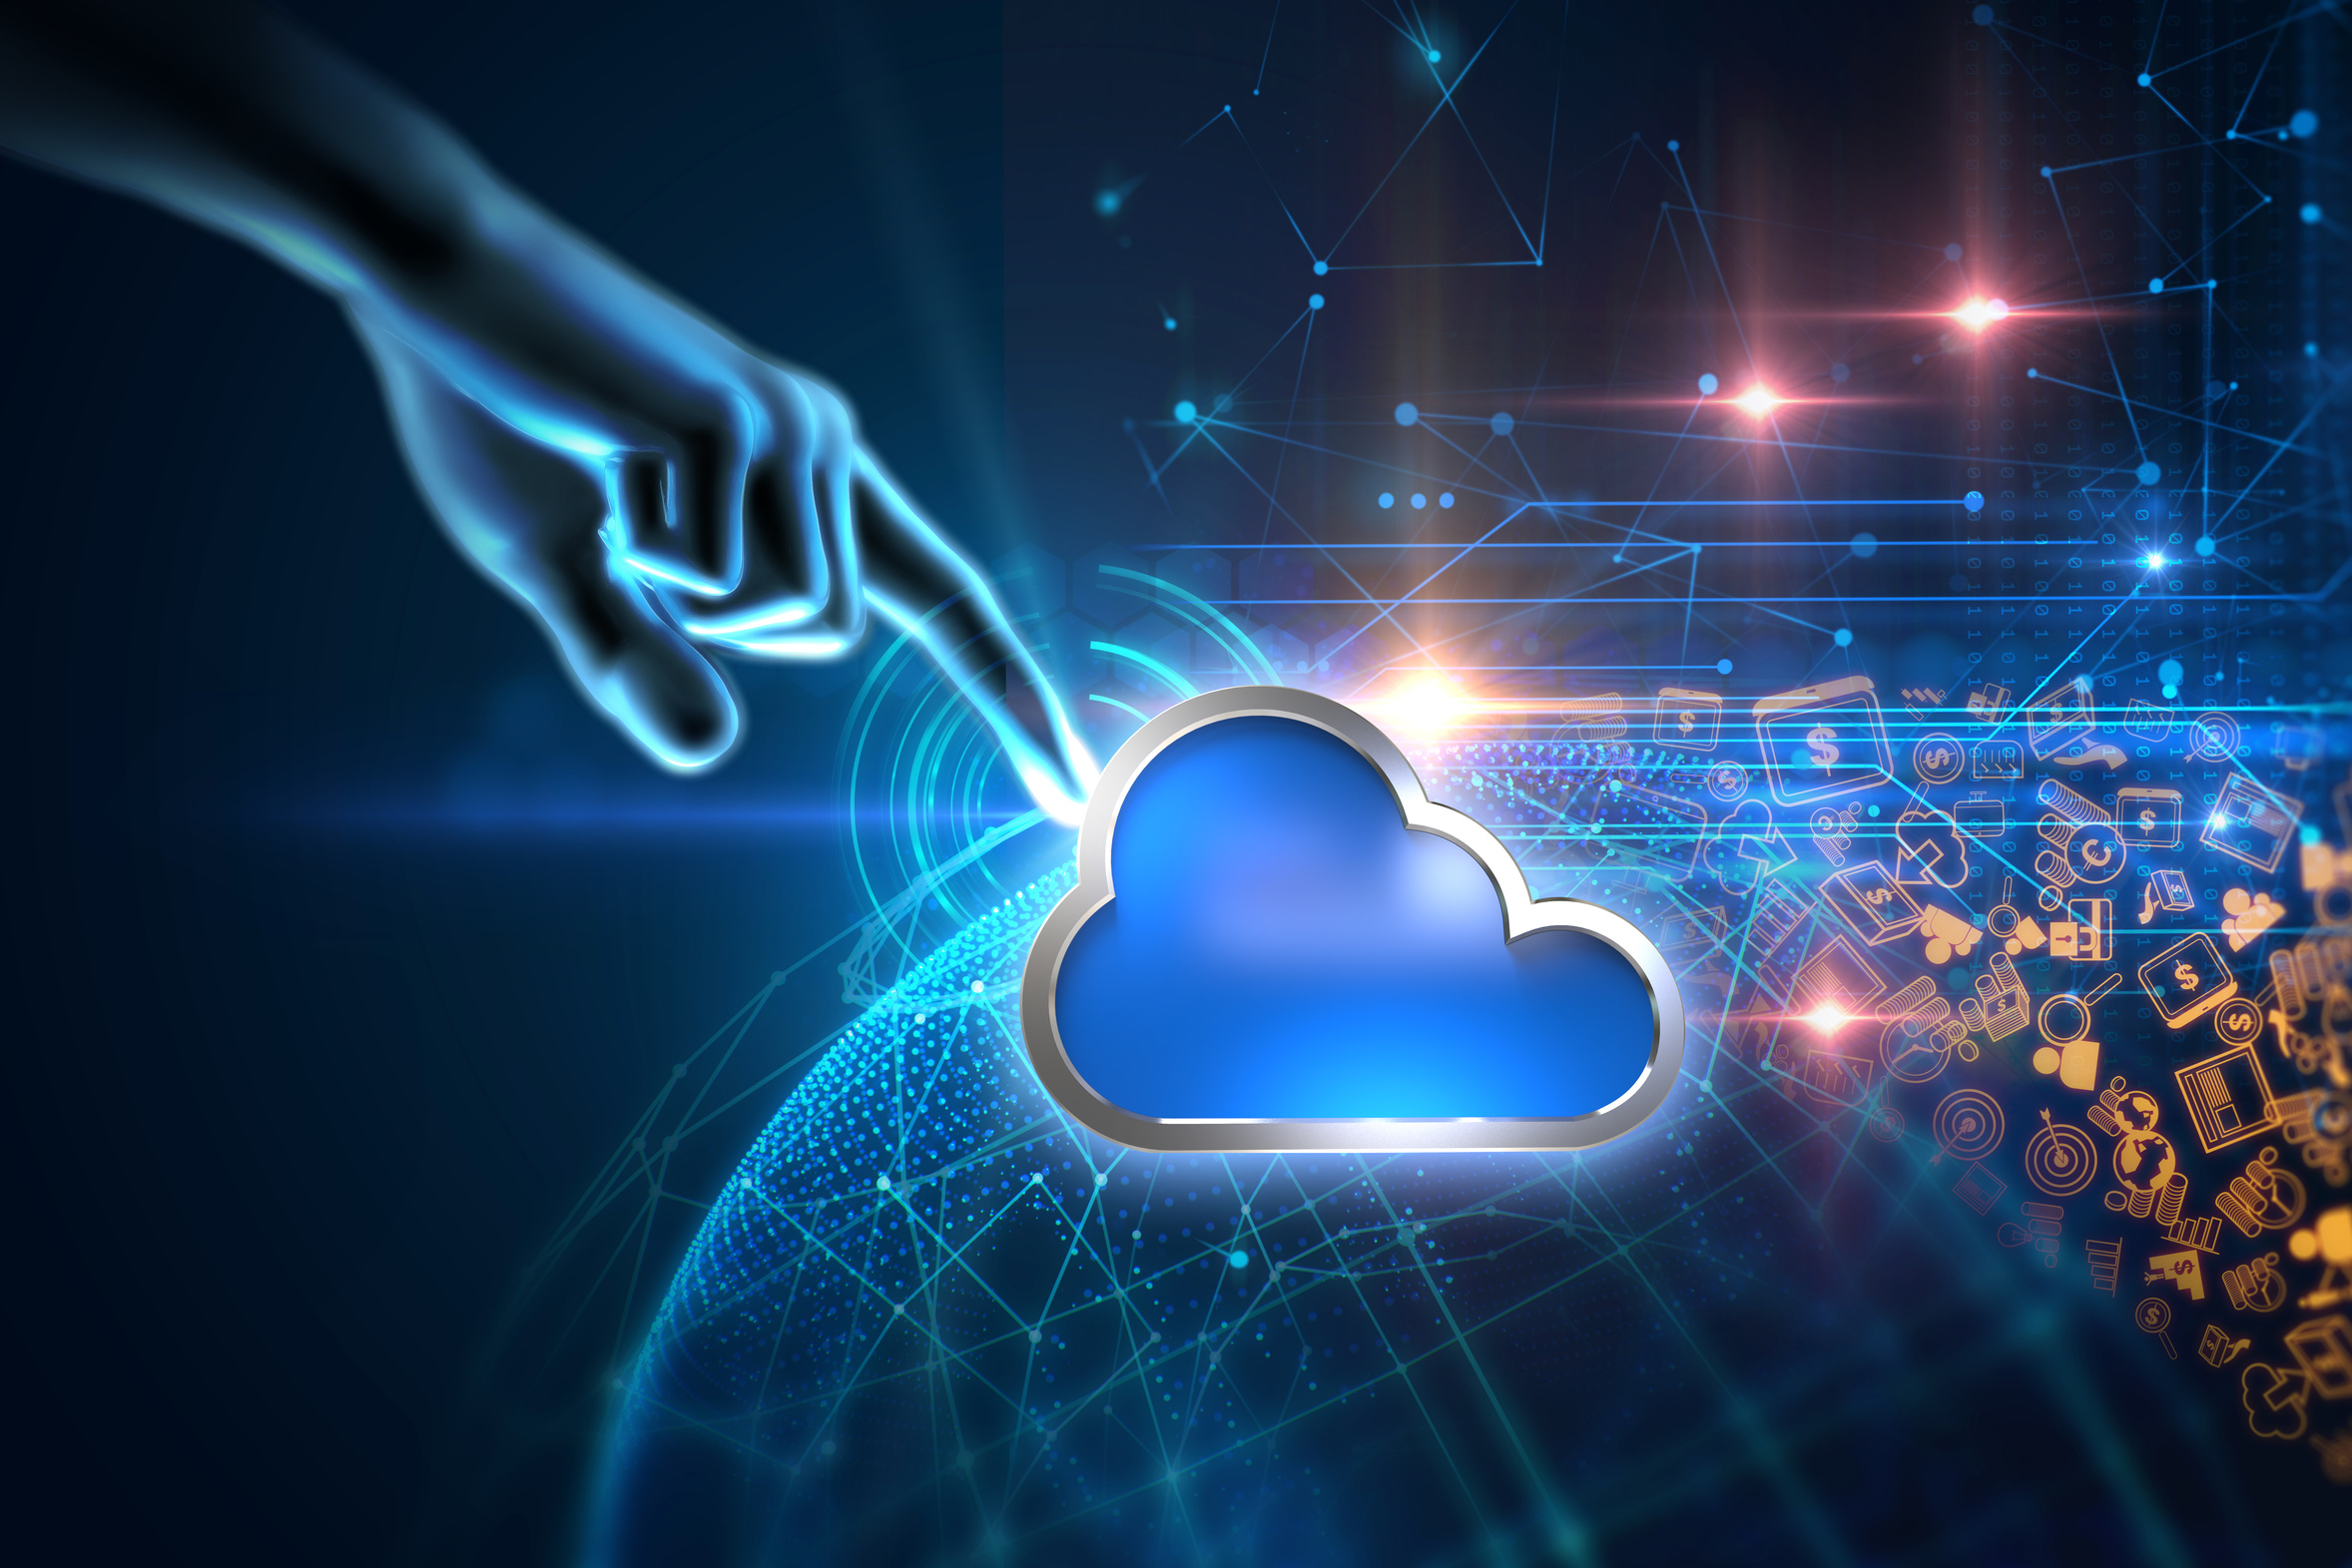 Sekcja start-upów w Cloud Community Europe